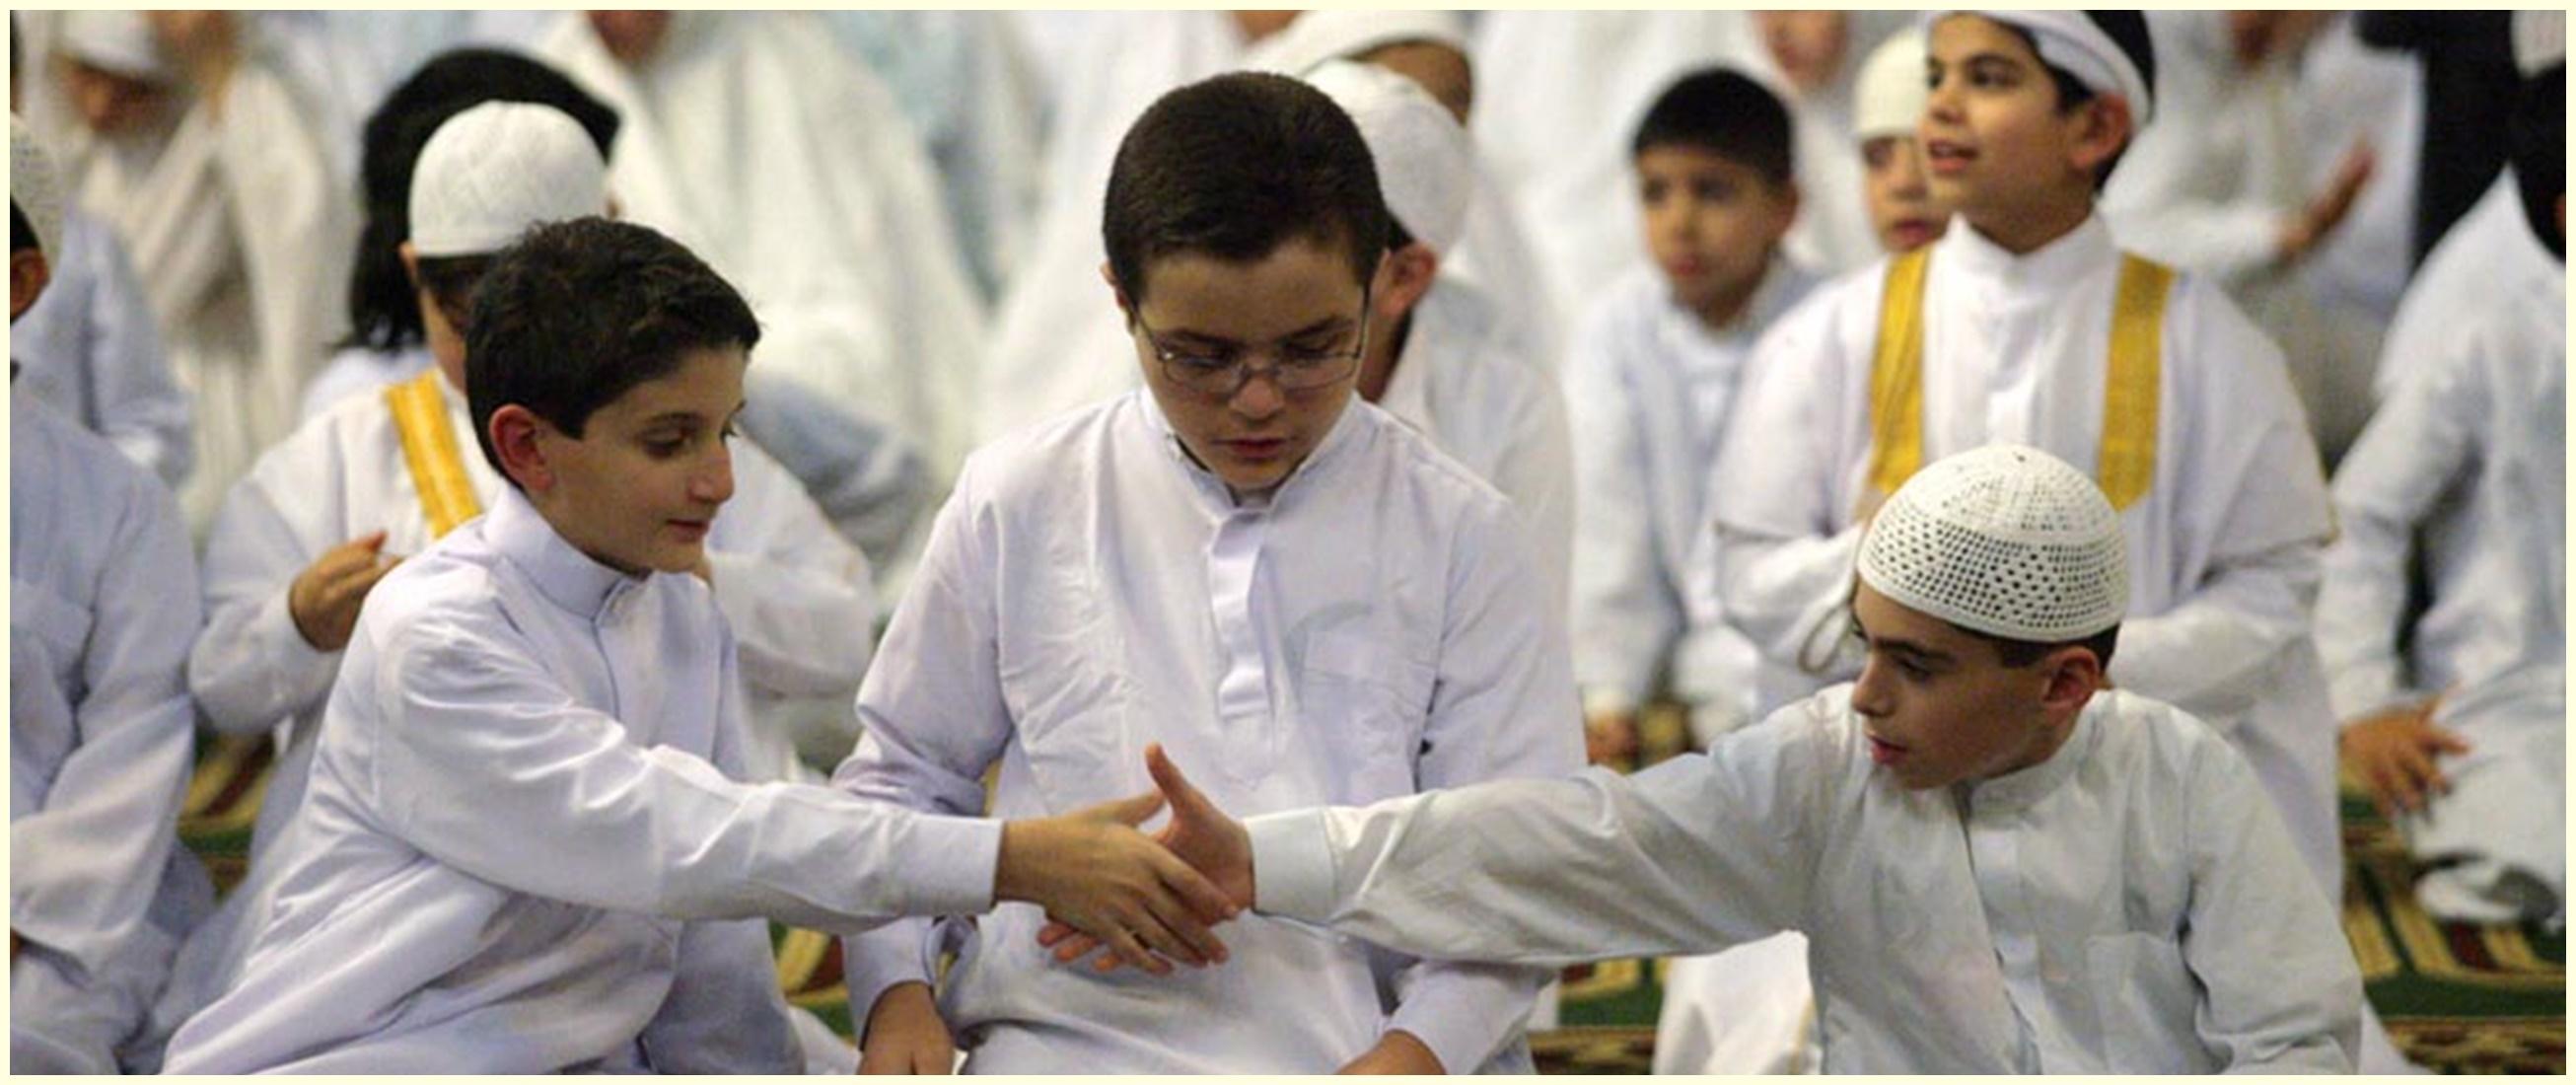 40 Kata-kata ucapan menyambut Ramadhan, menyentuh hati